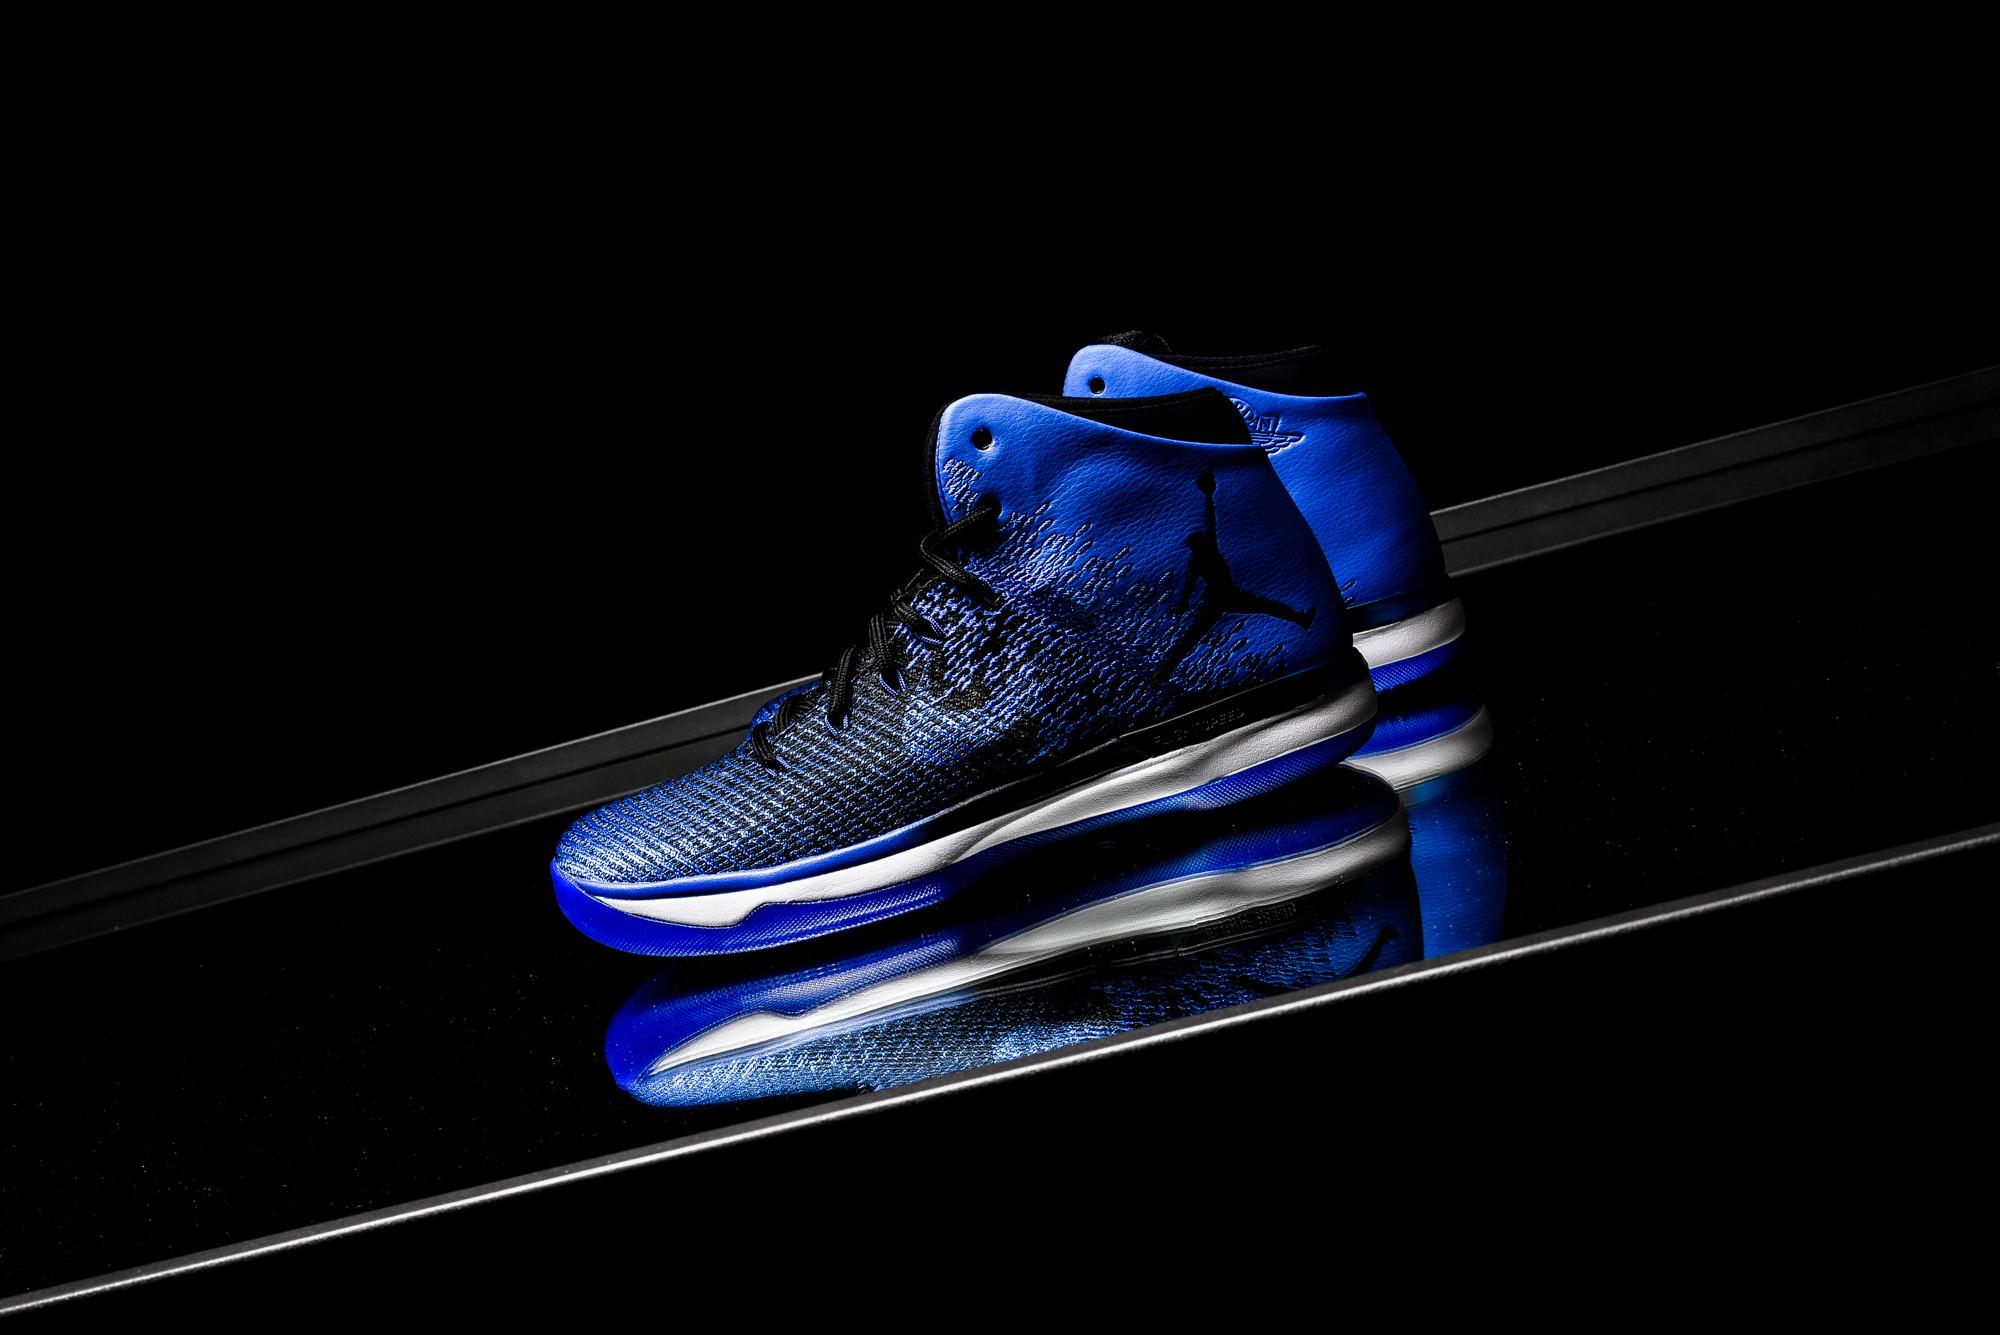 new styles da028 5beb1 Are You Looking Forward To The Air Jordan 31 Royal ...